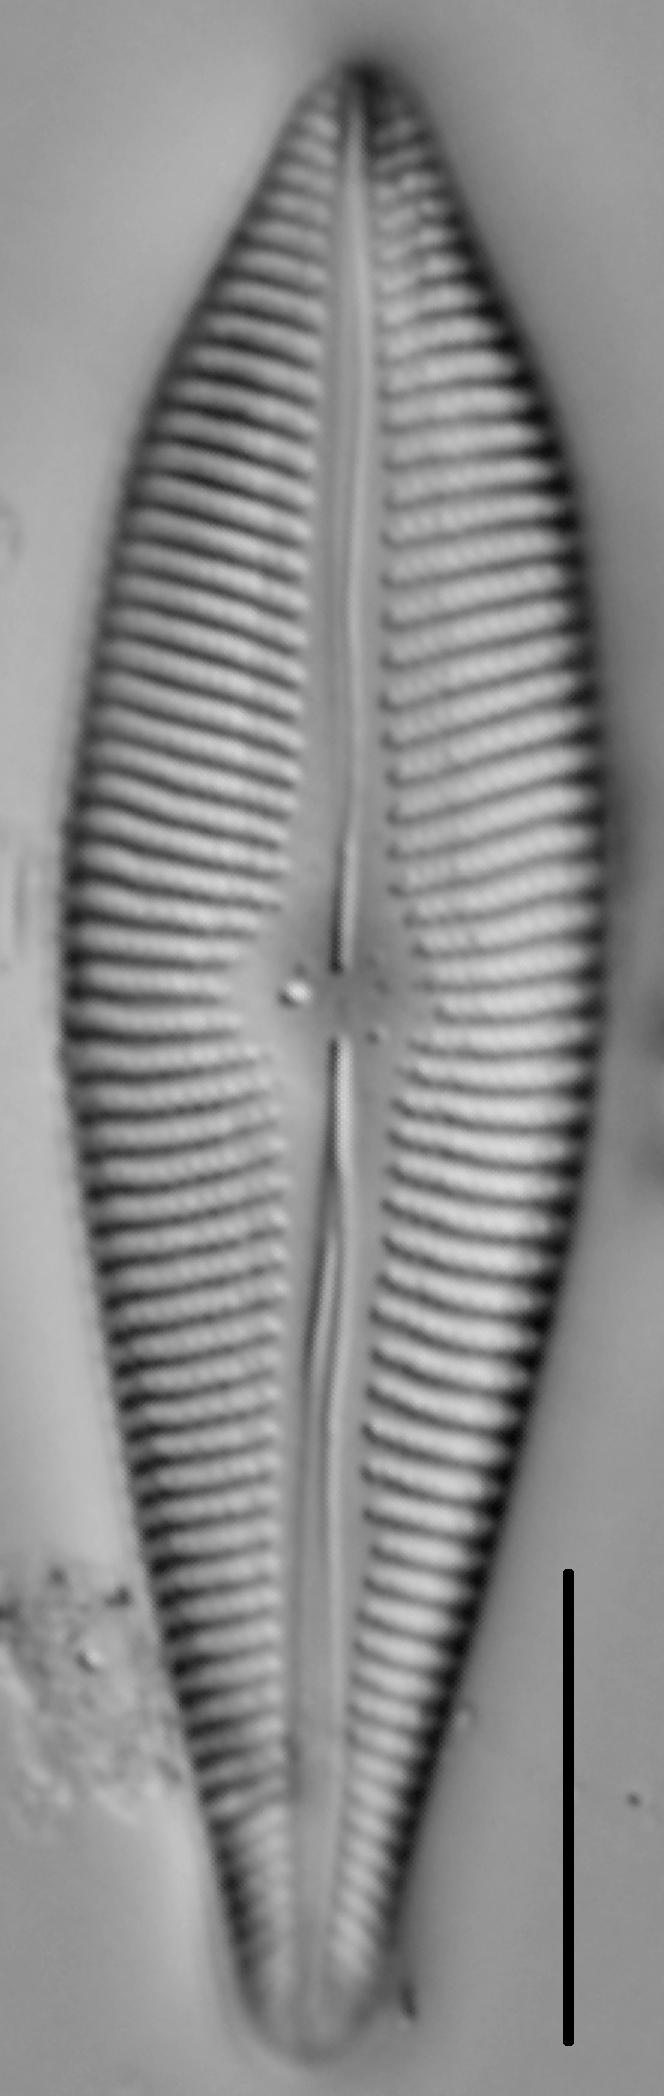 Gomphoneis eriense var. apiculata LM2